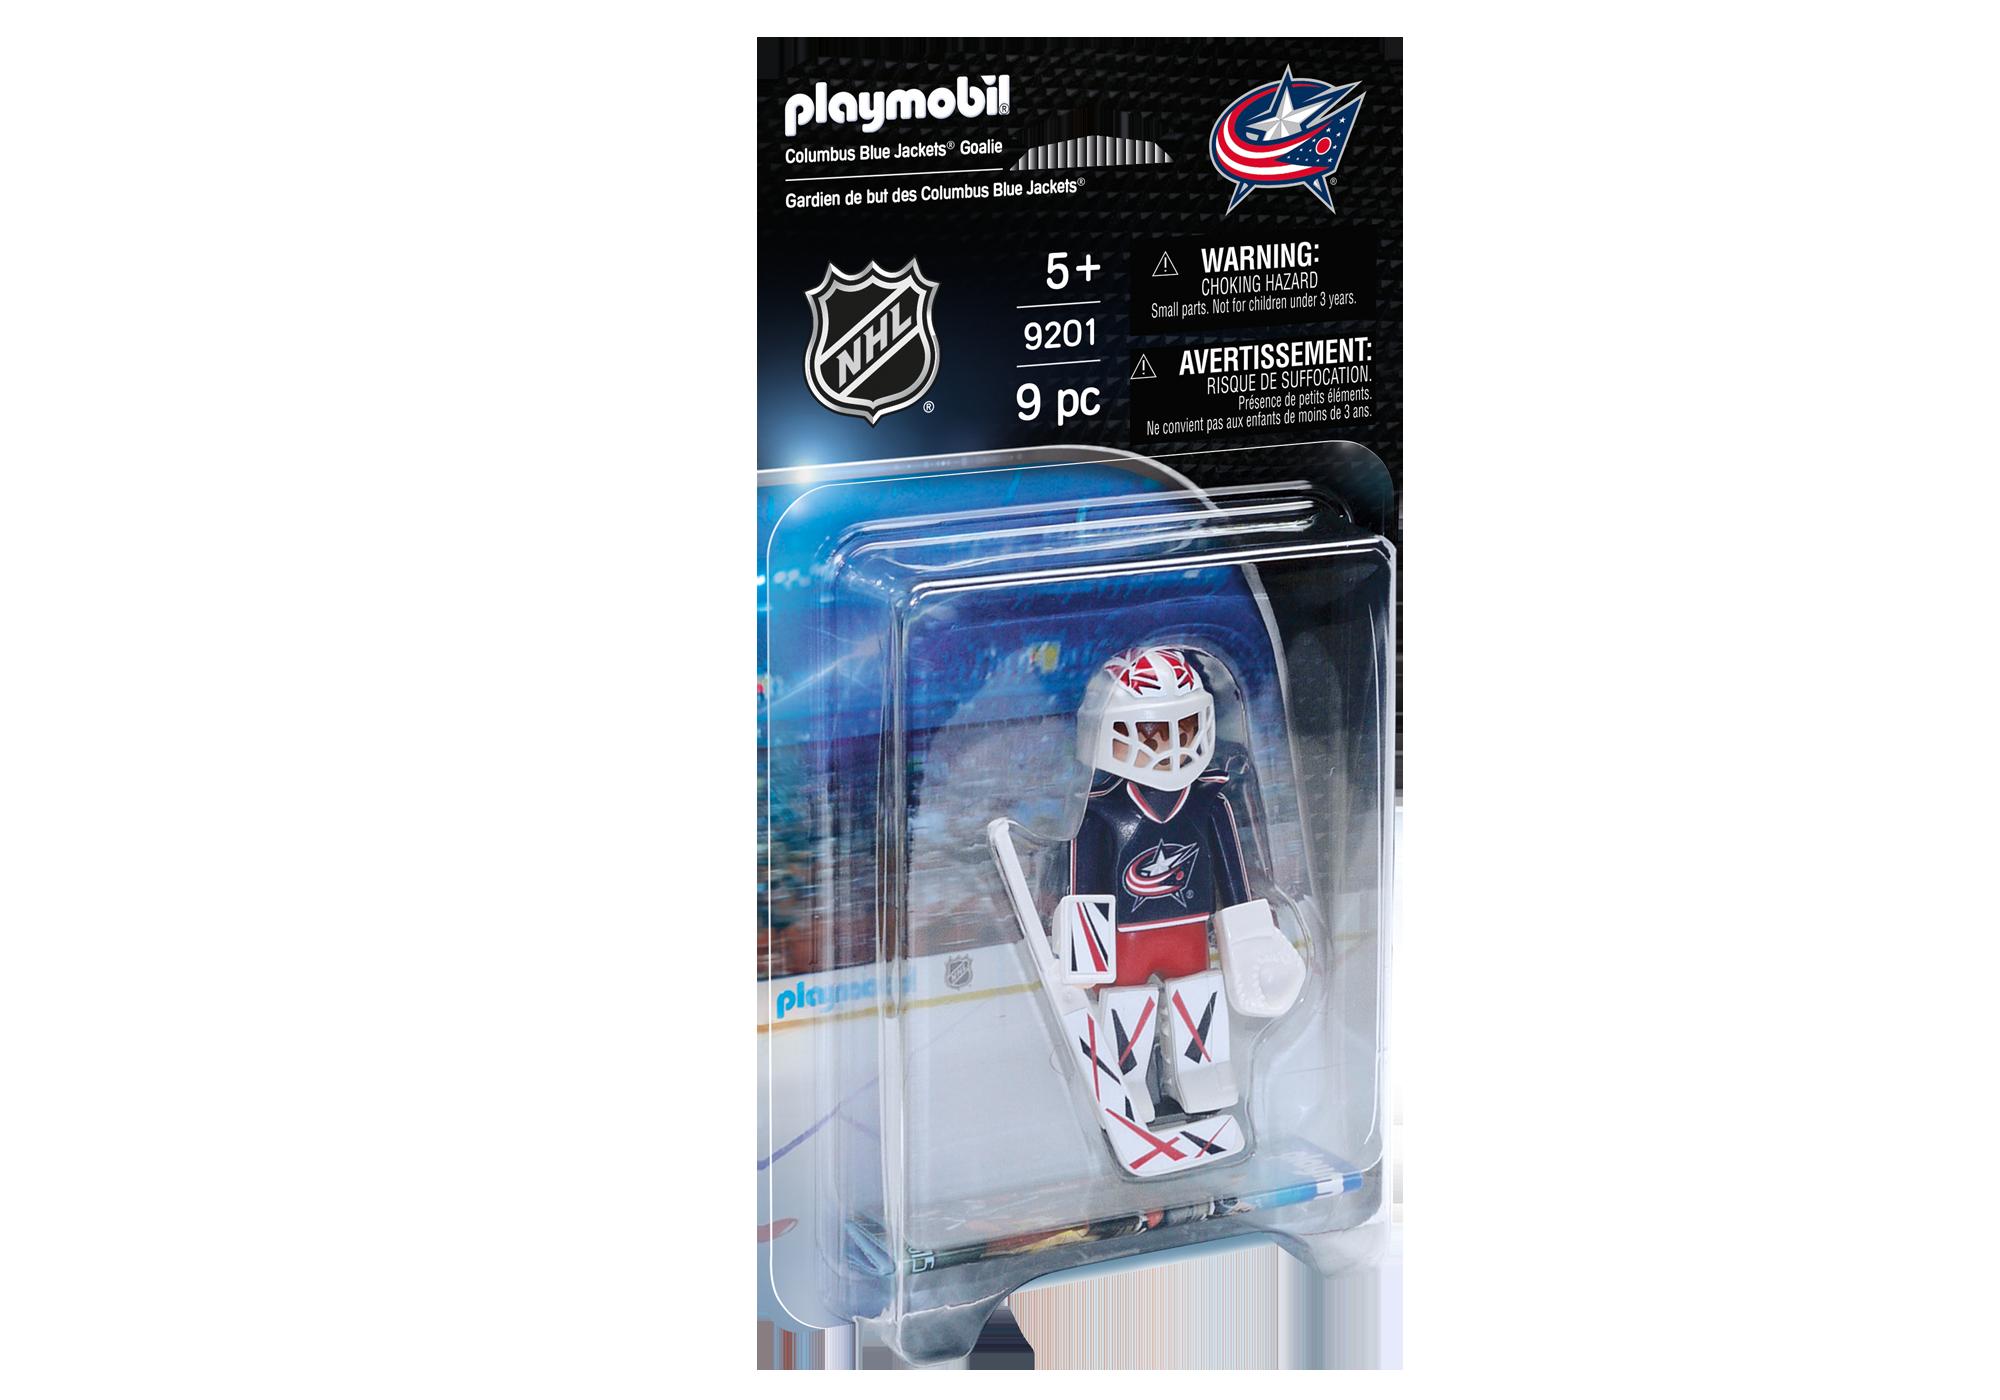 http://media.playmobil.com/i/playmobil/9201_product_box_front/NHL™ Columbus Blue Jackets™ Goalie